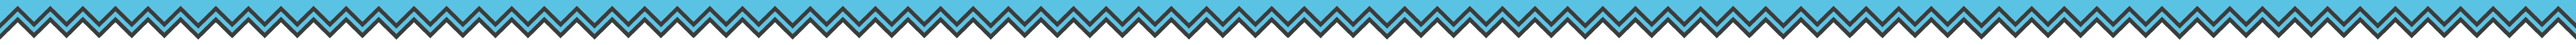 header blauw boven - wit beneden